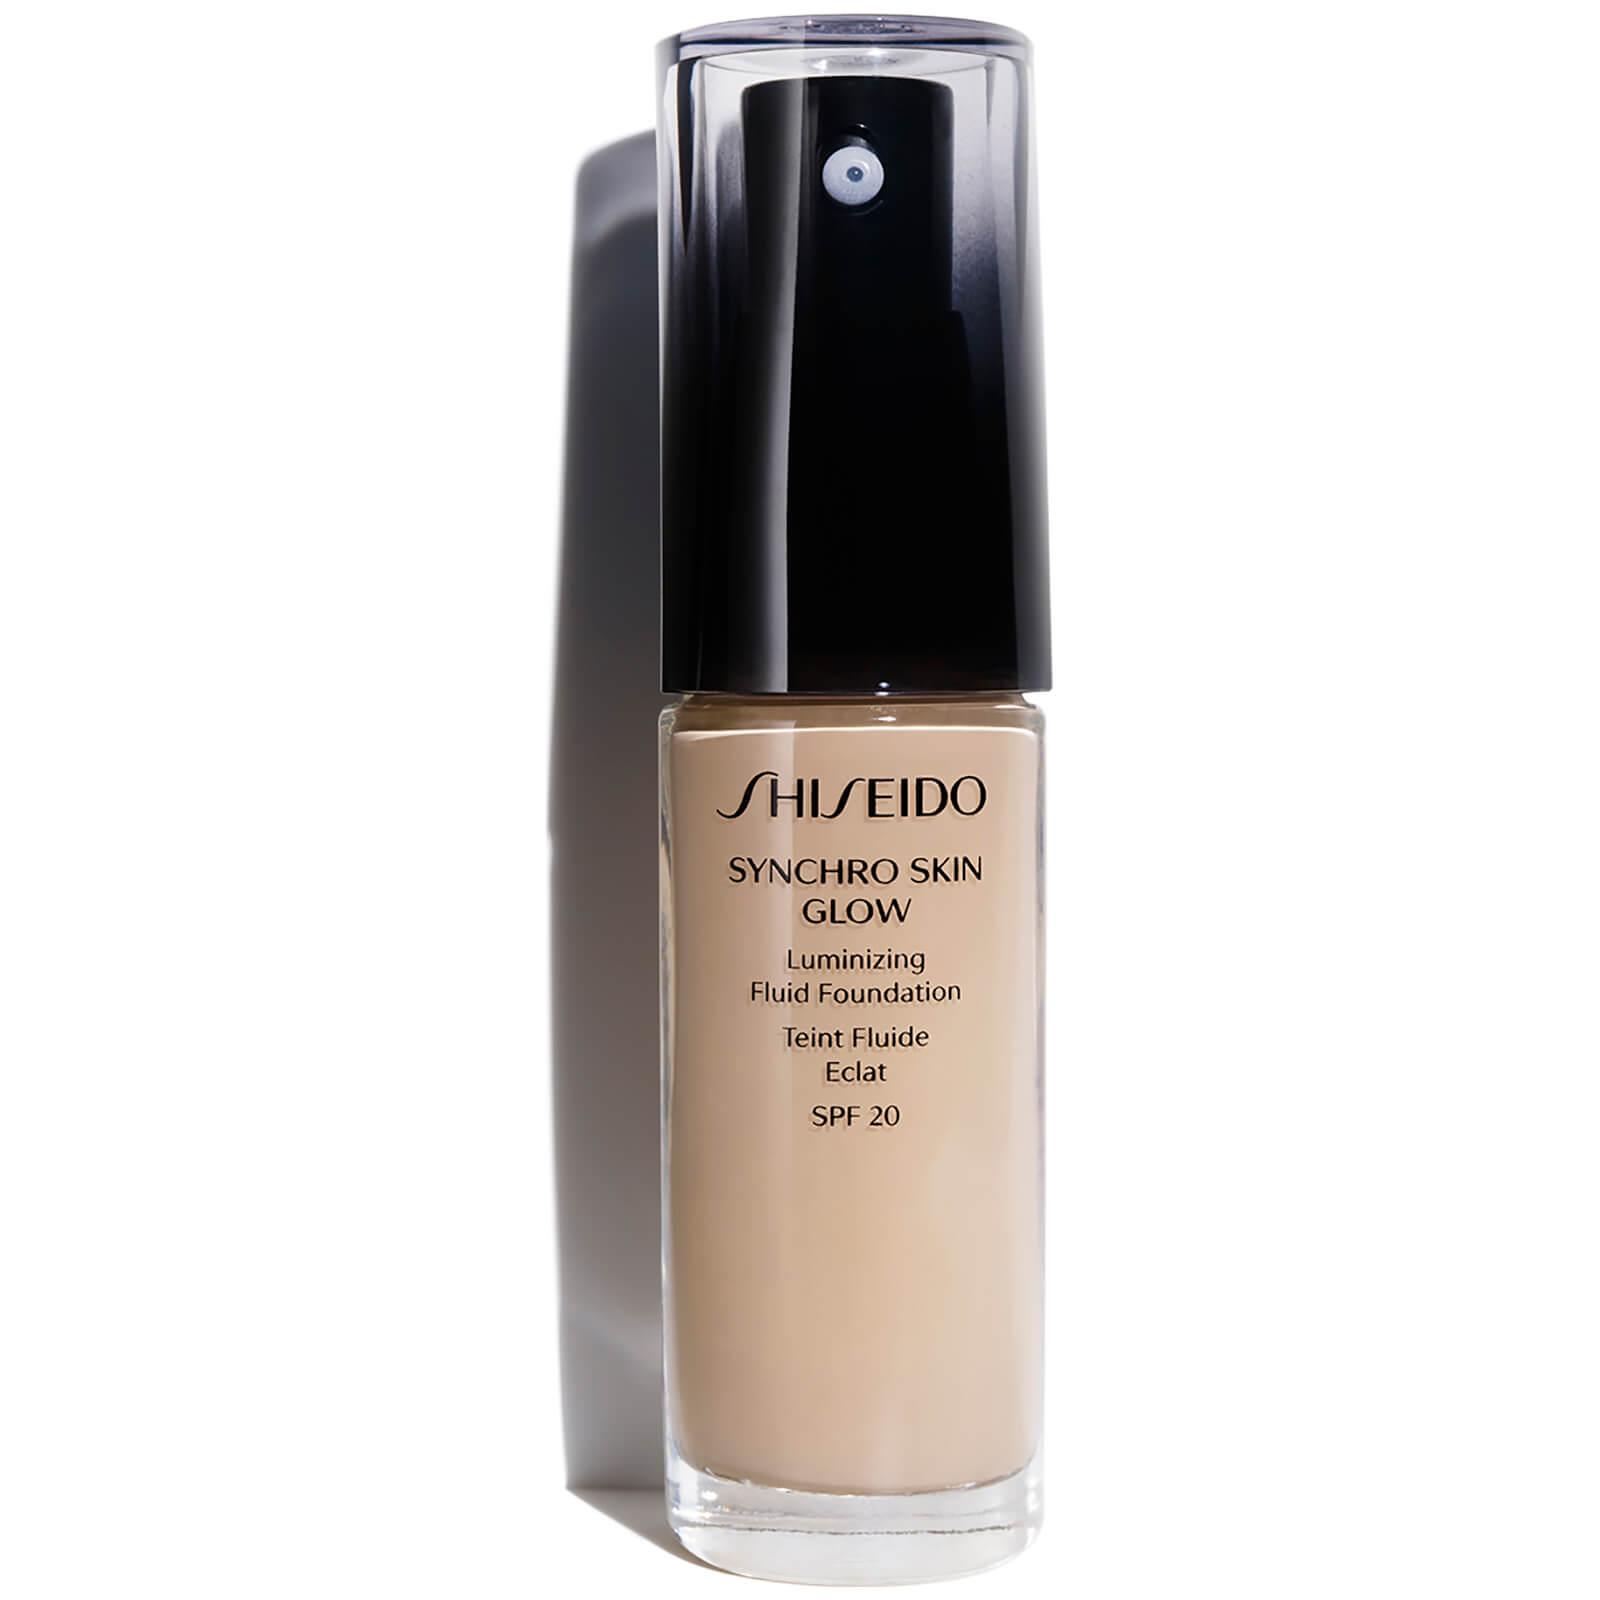 Shiseido Synchro Skin Glow Luminizing Foundation 30 ml (varie tonalità) - Neutral 2